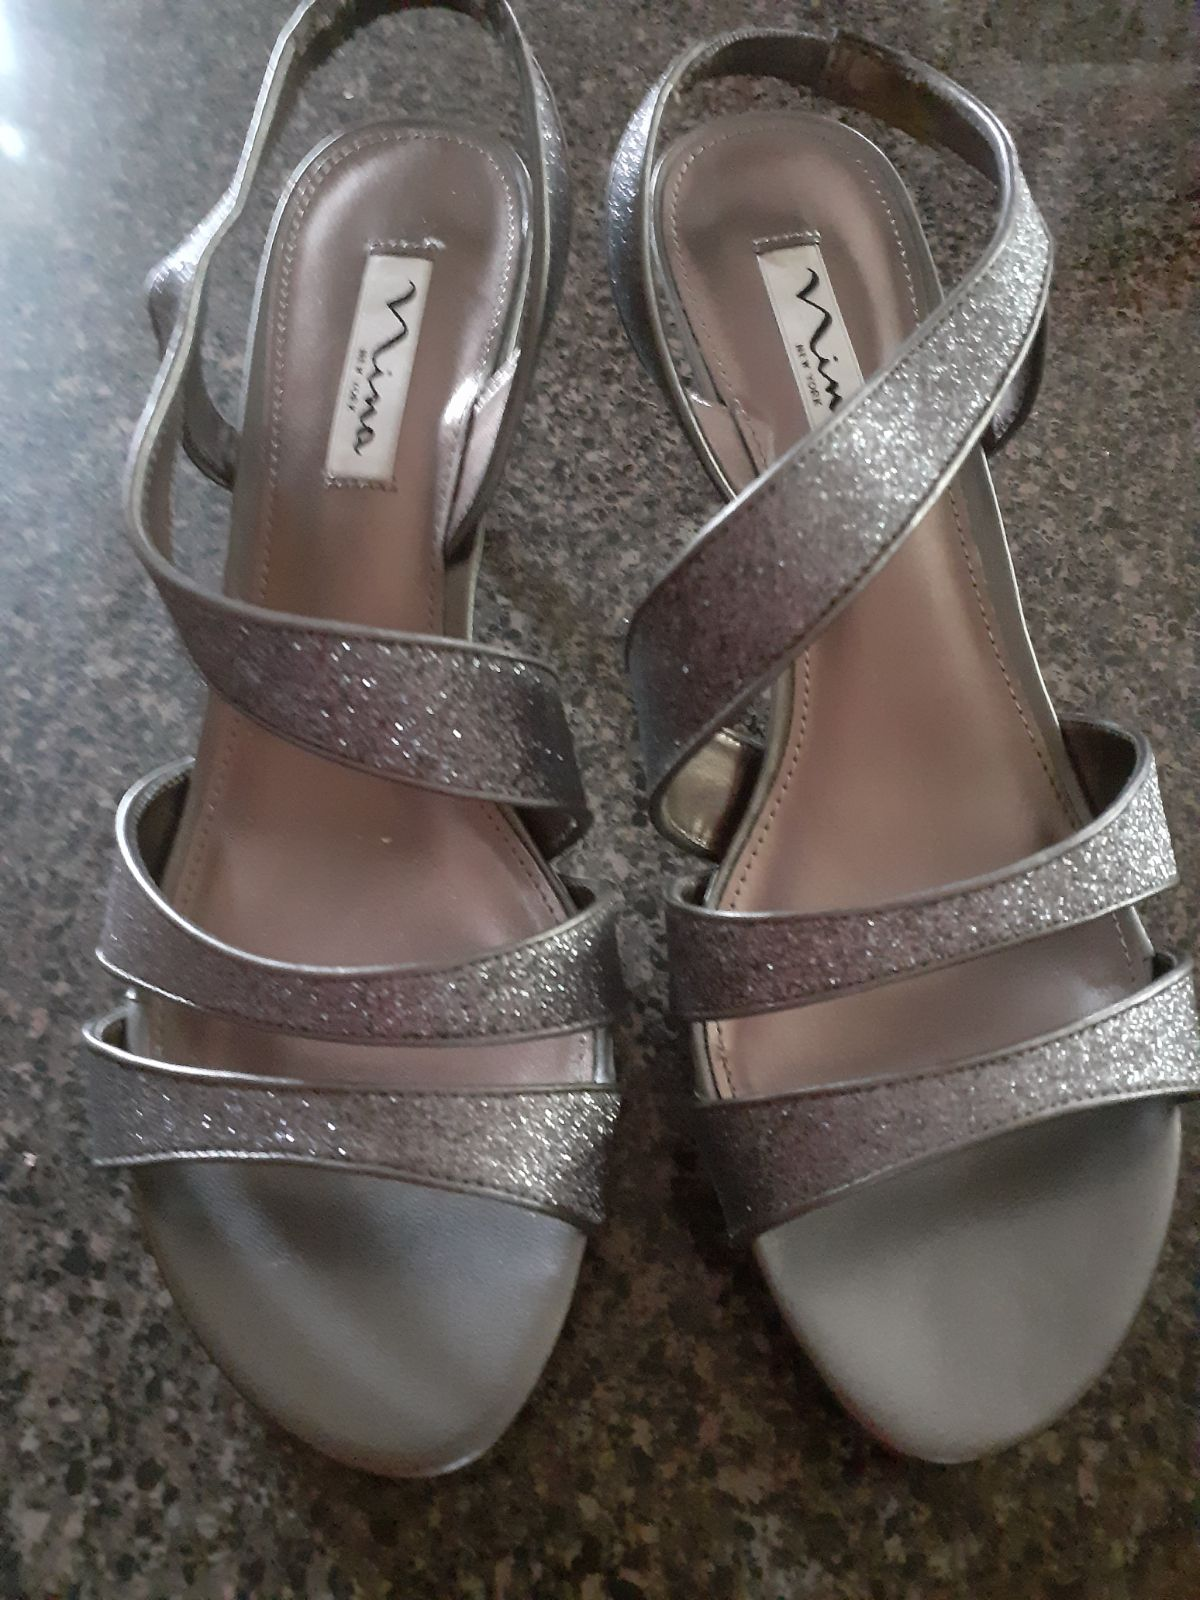 Gray Sparkle evening sandals